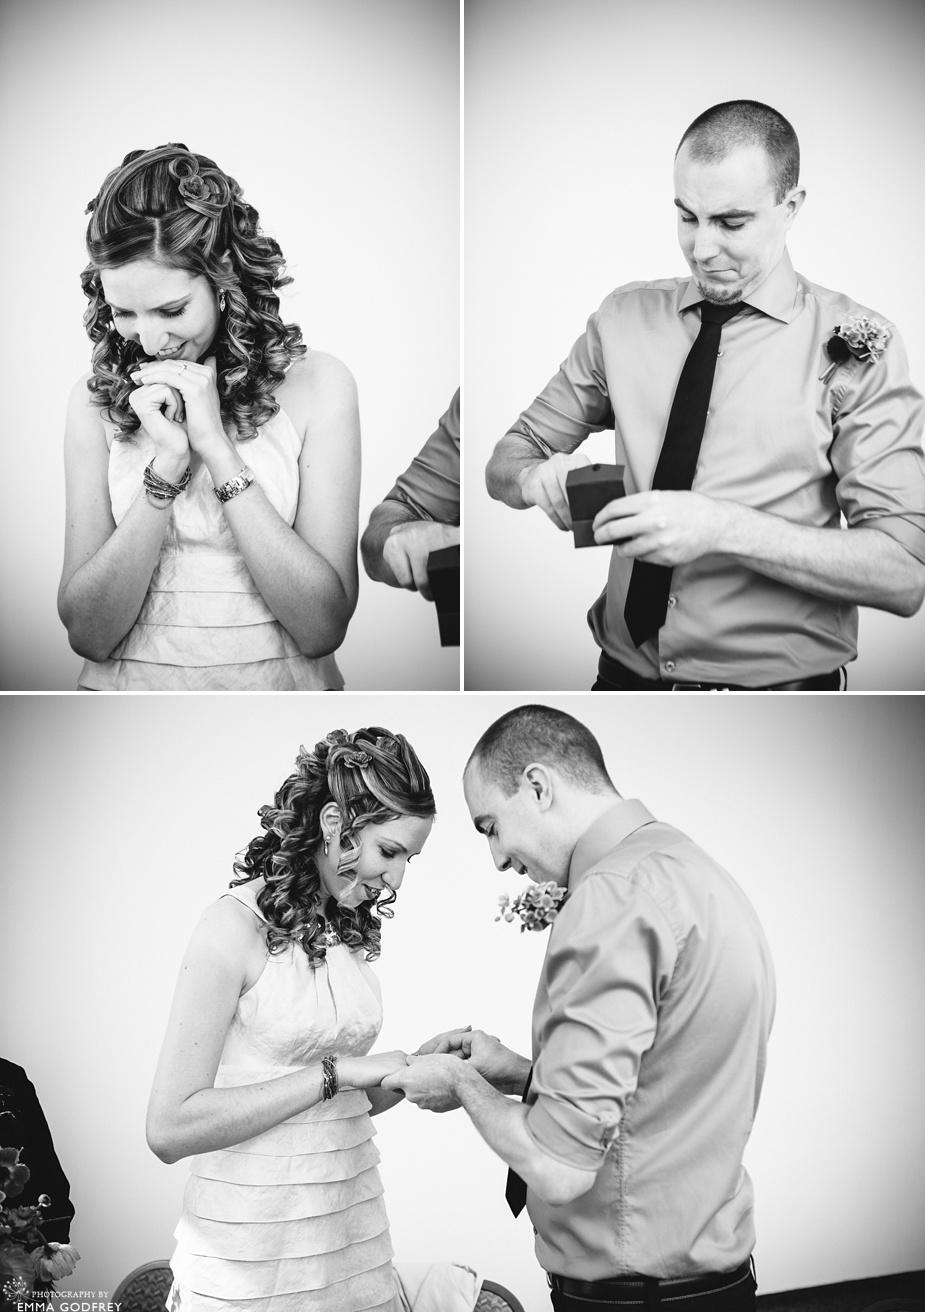 Civil-wedding-morges-rolle-photographer_0005.jpg